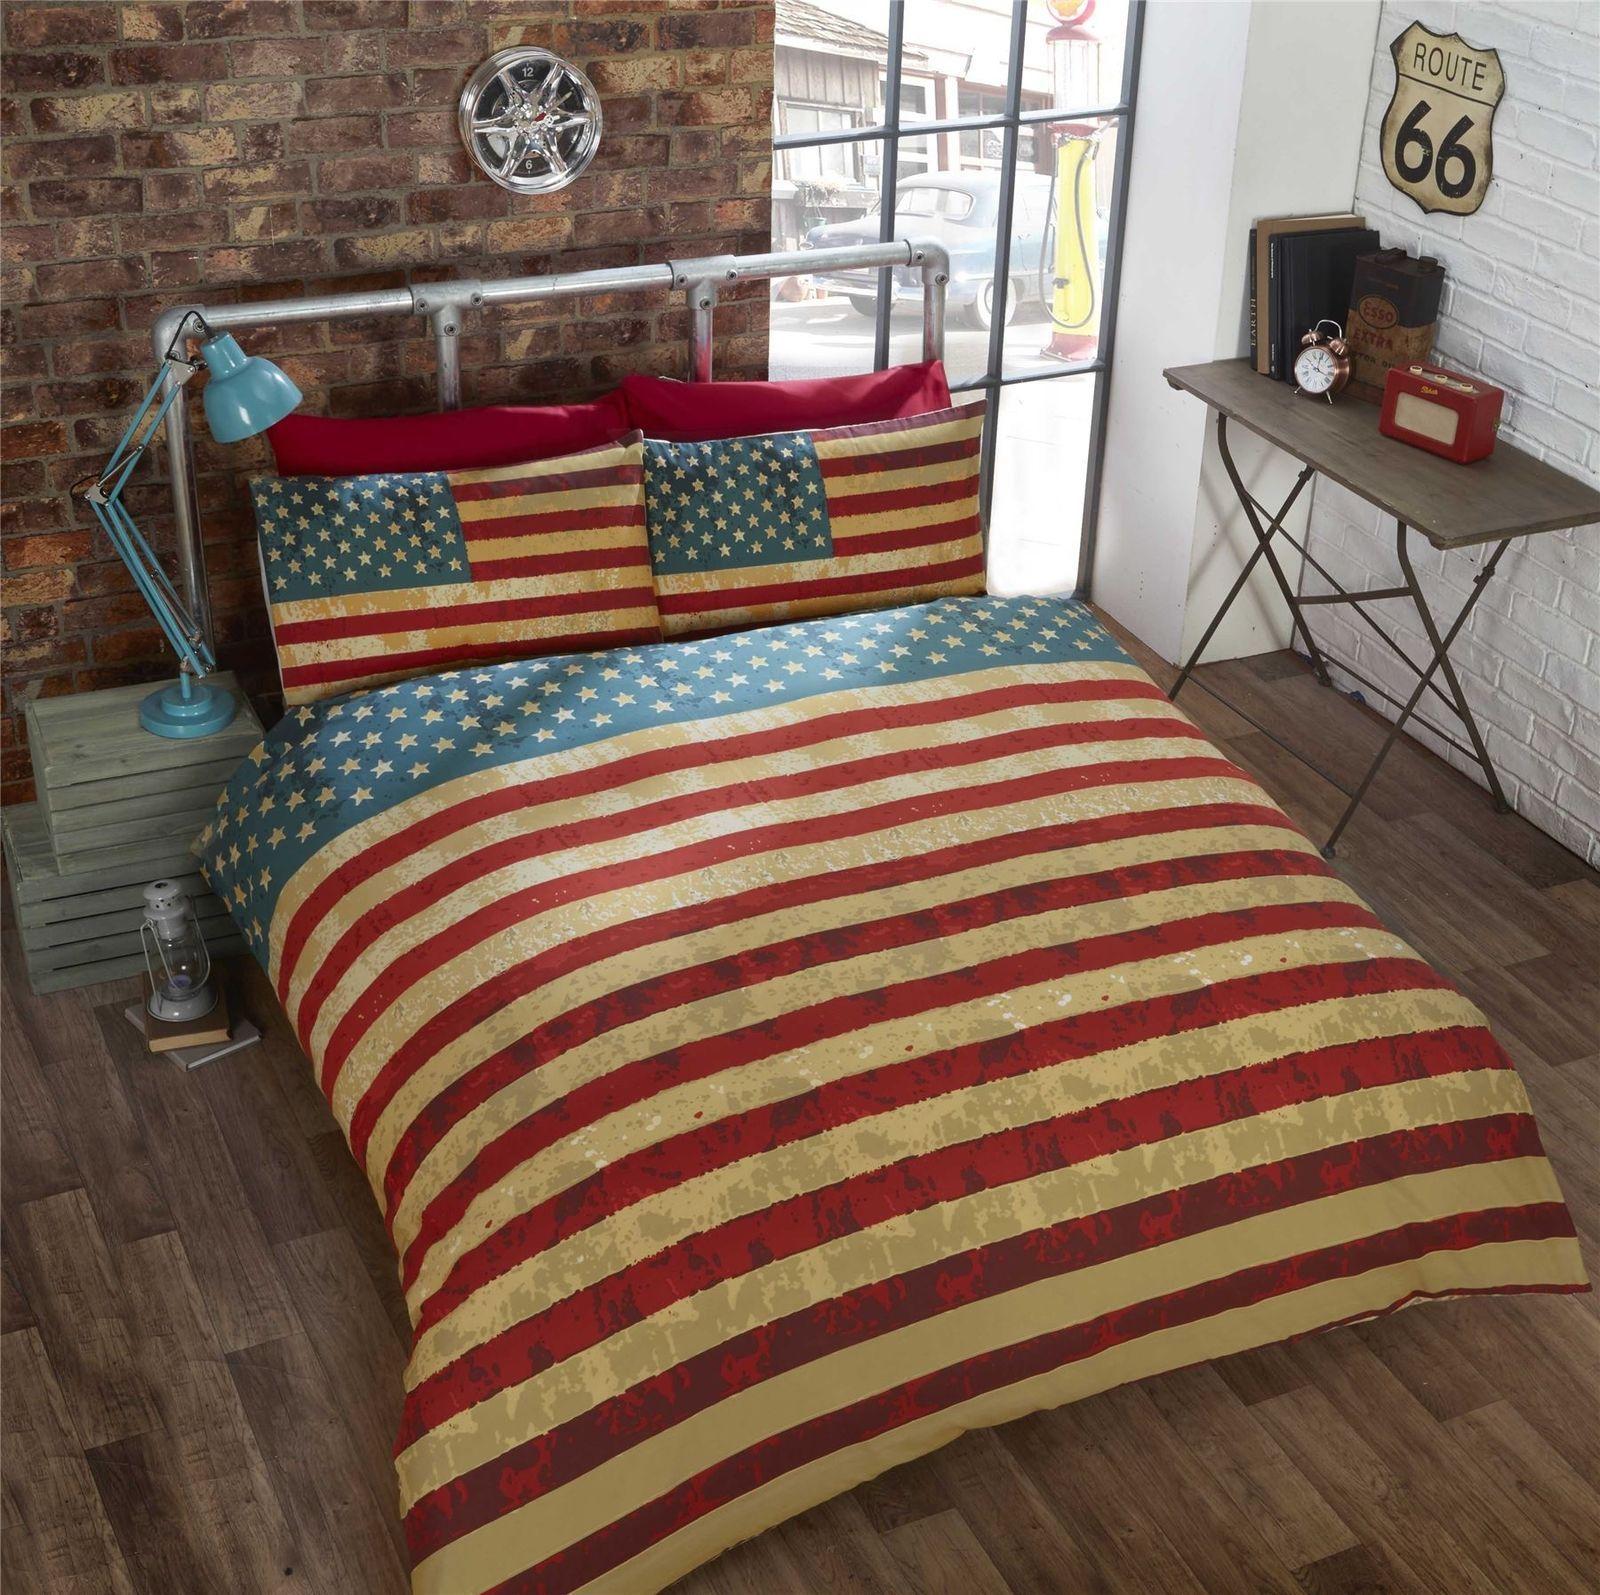 Vintage American Flag Bedding